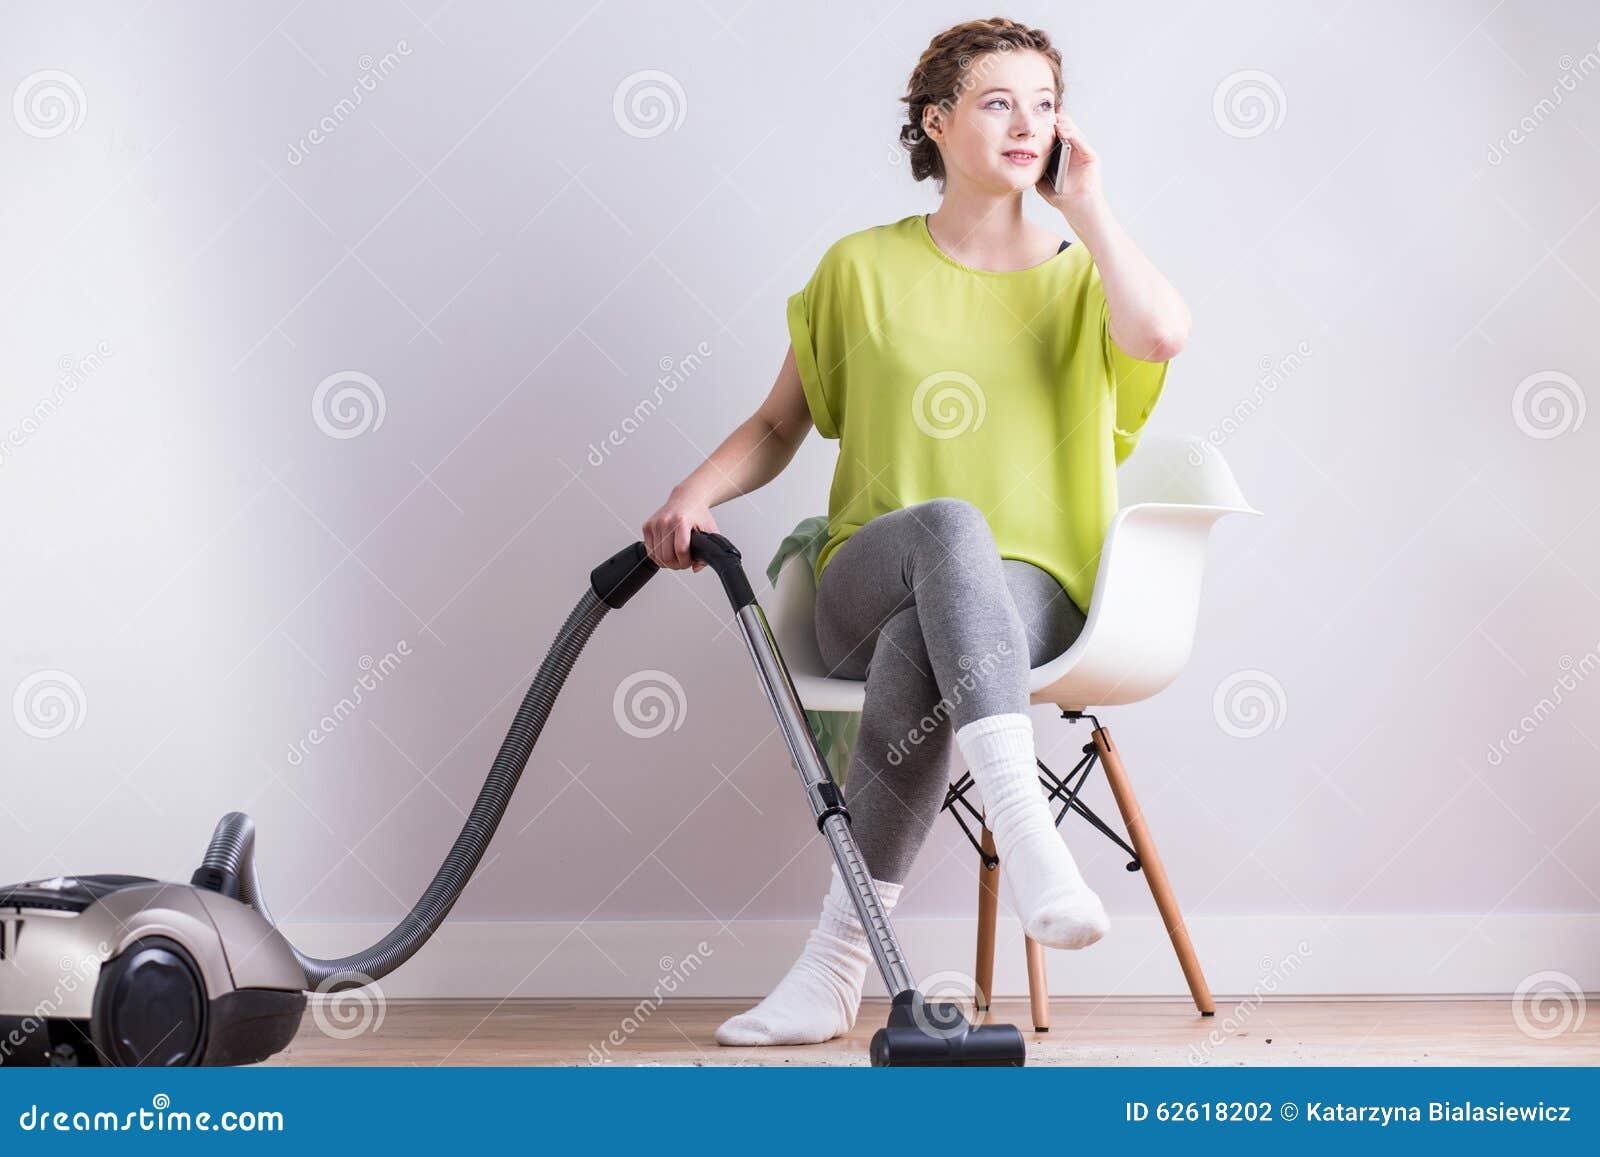 Good organisation of home duties